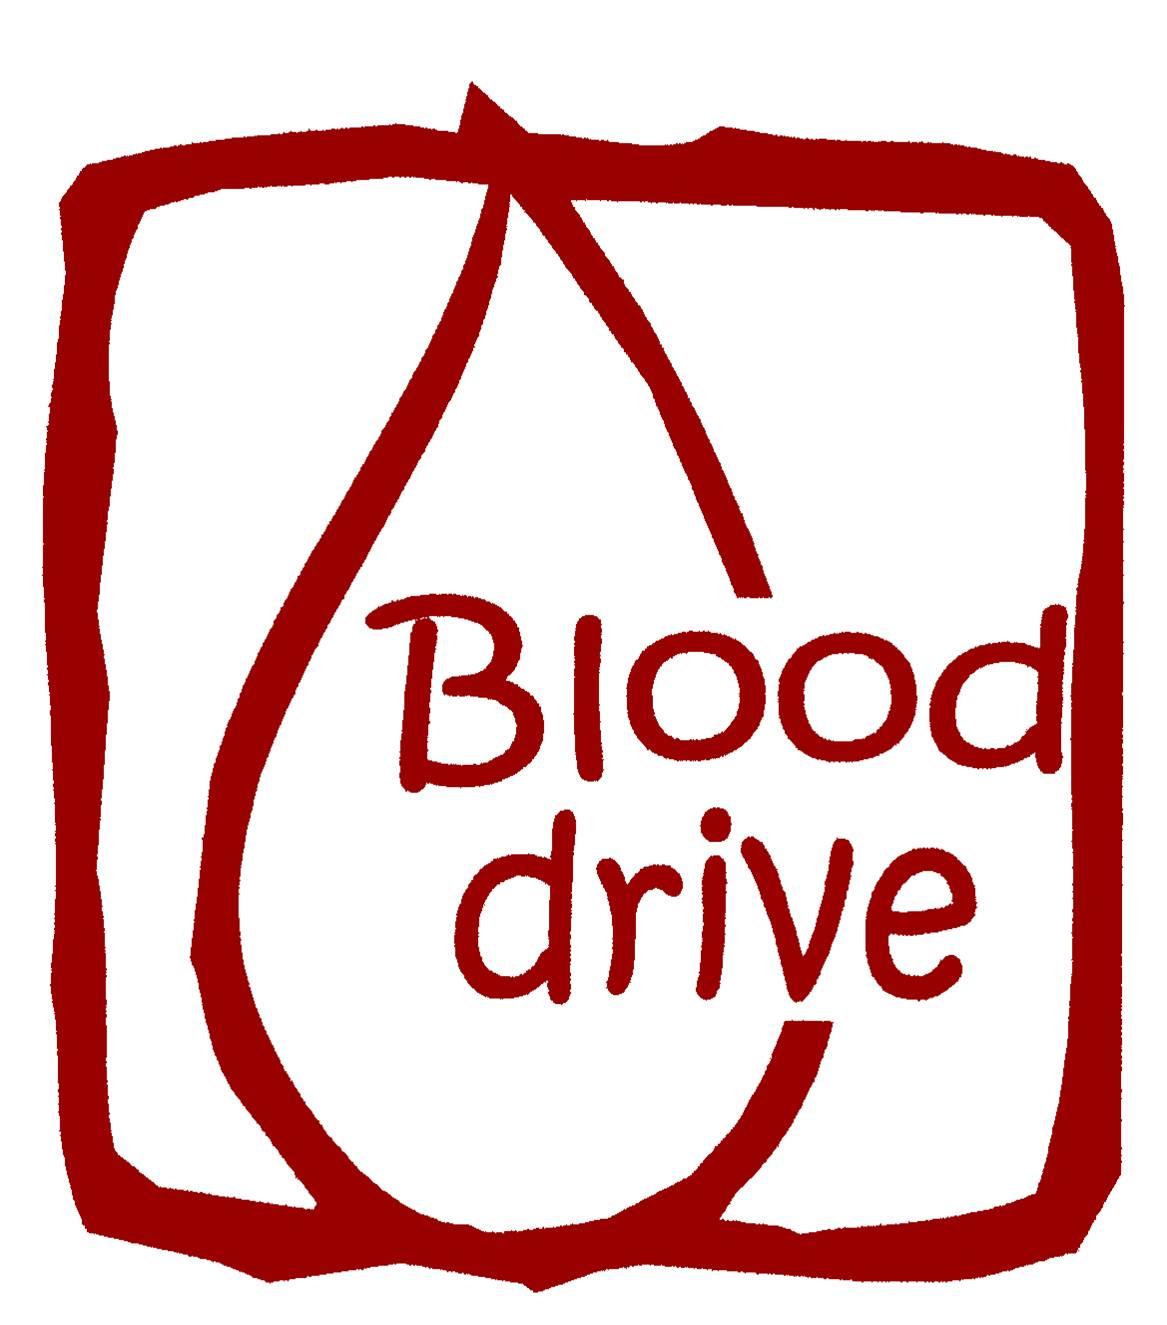 Clip Art Blood Drive Clip Art community blood drive clipart best reminder justsaynews com clipart